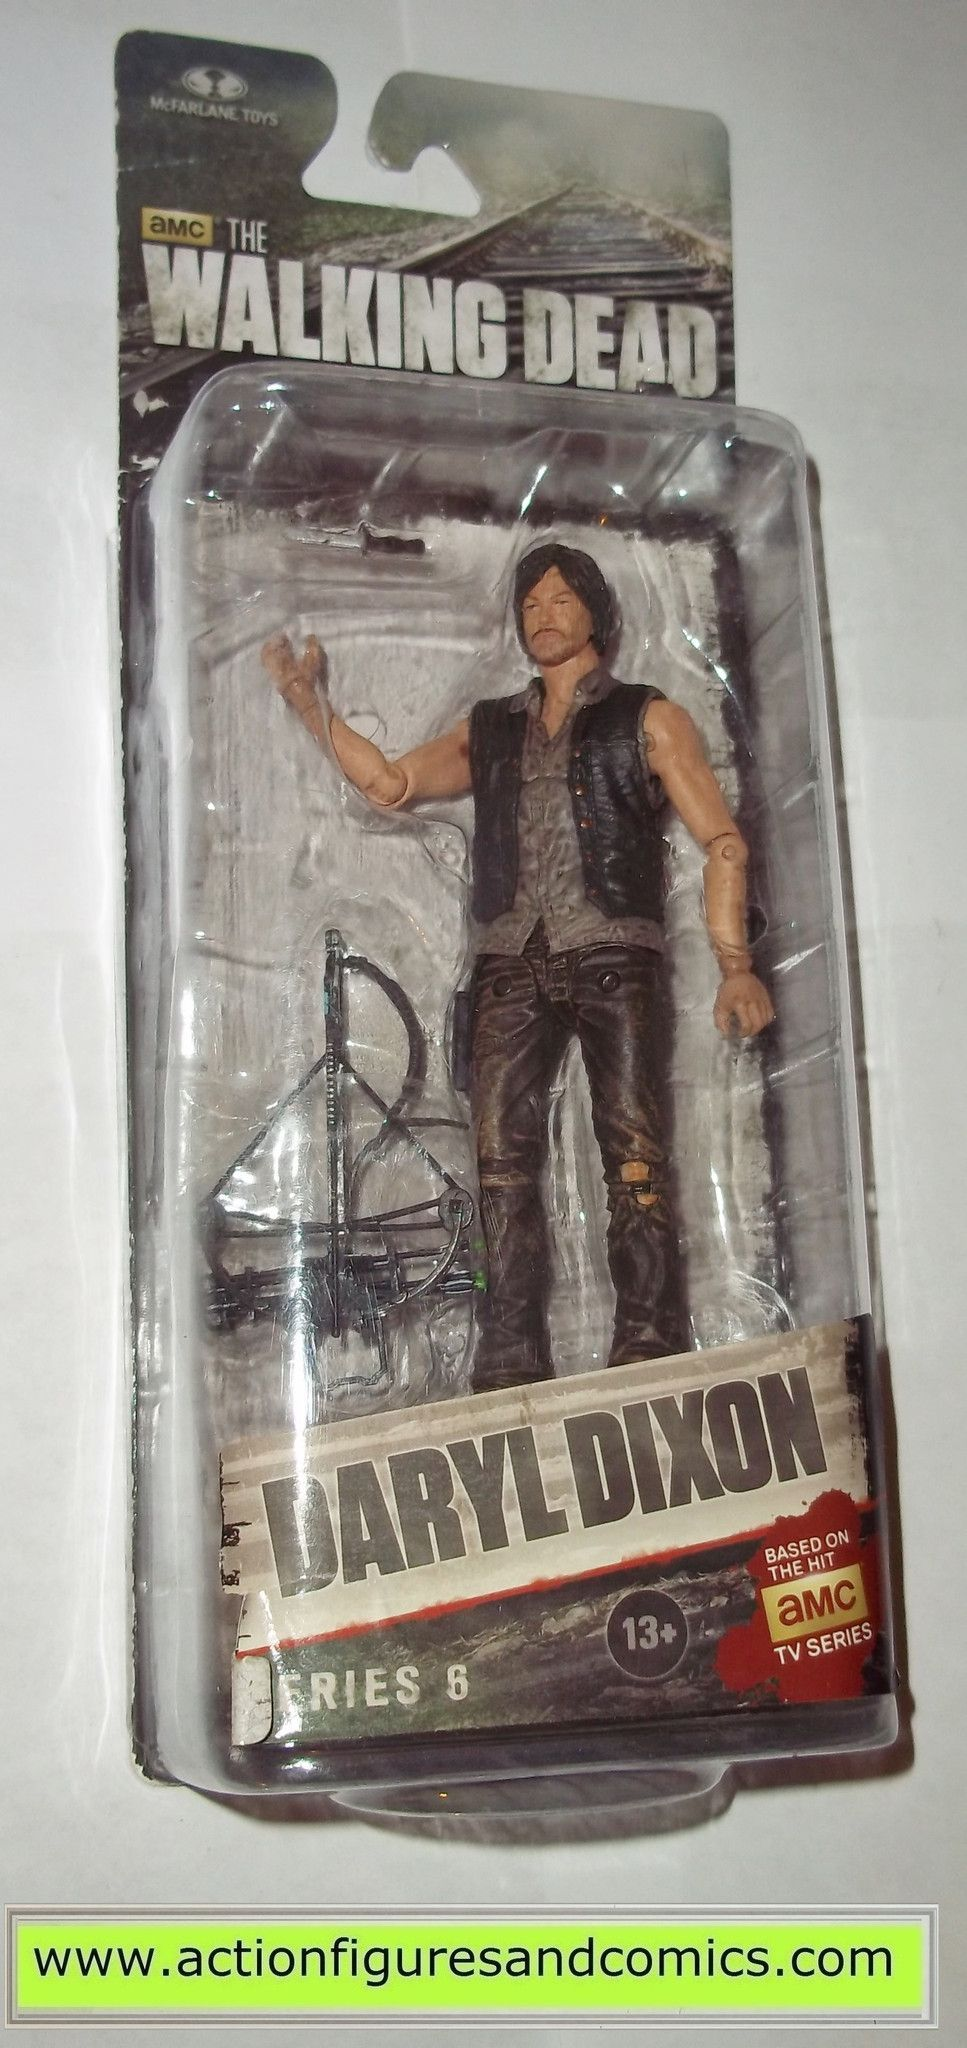 Mcfarlane walking dead series 6 daryl dixon action figure - The Walking Dead Daryl Dixon Series 6 Mcfarlane Toys Action Figures